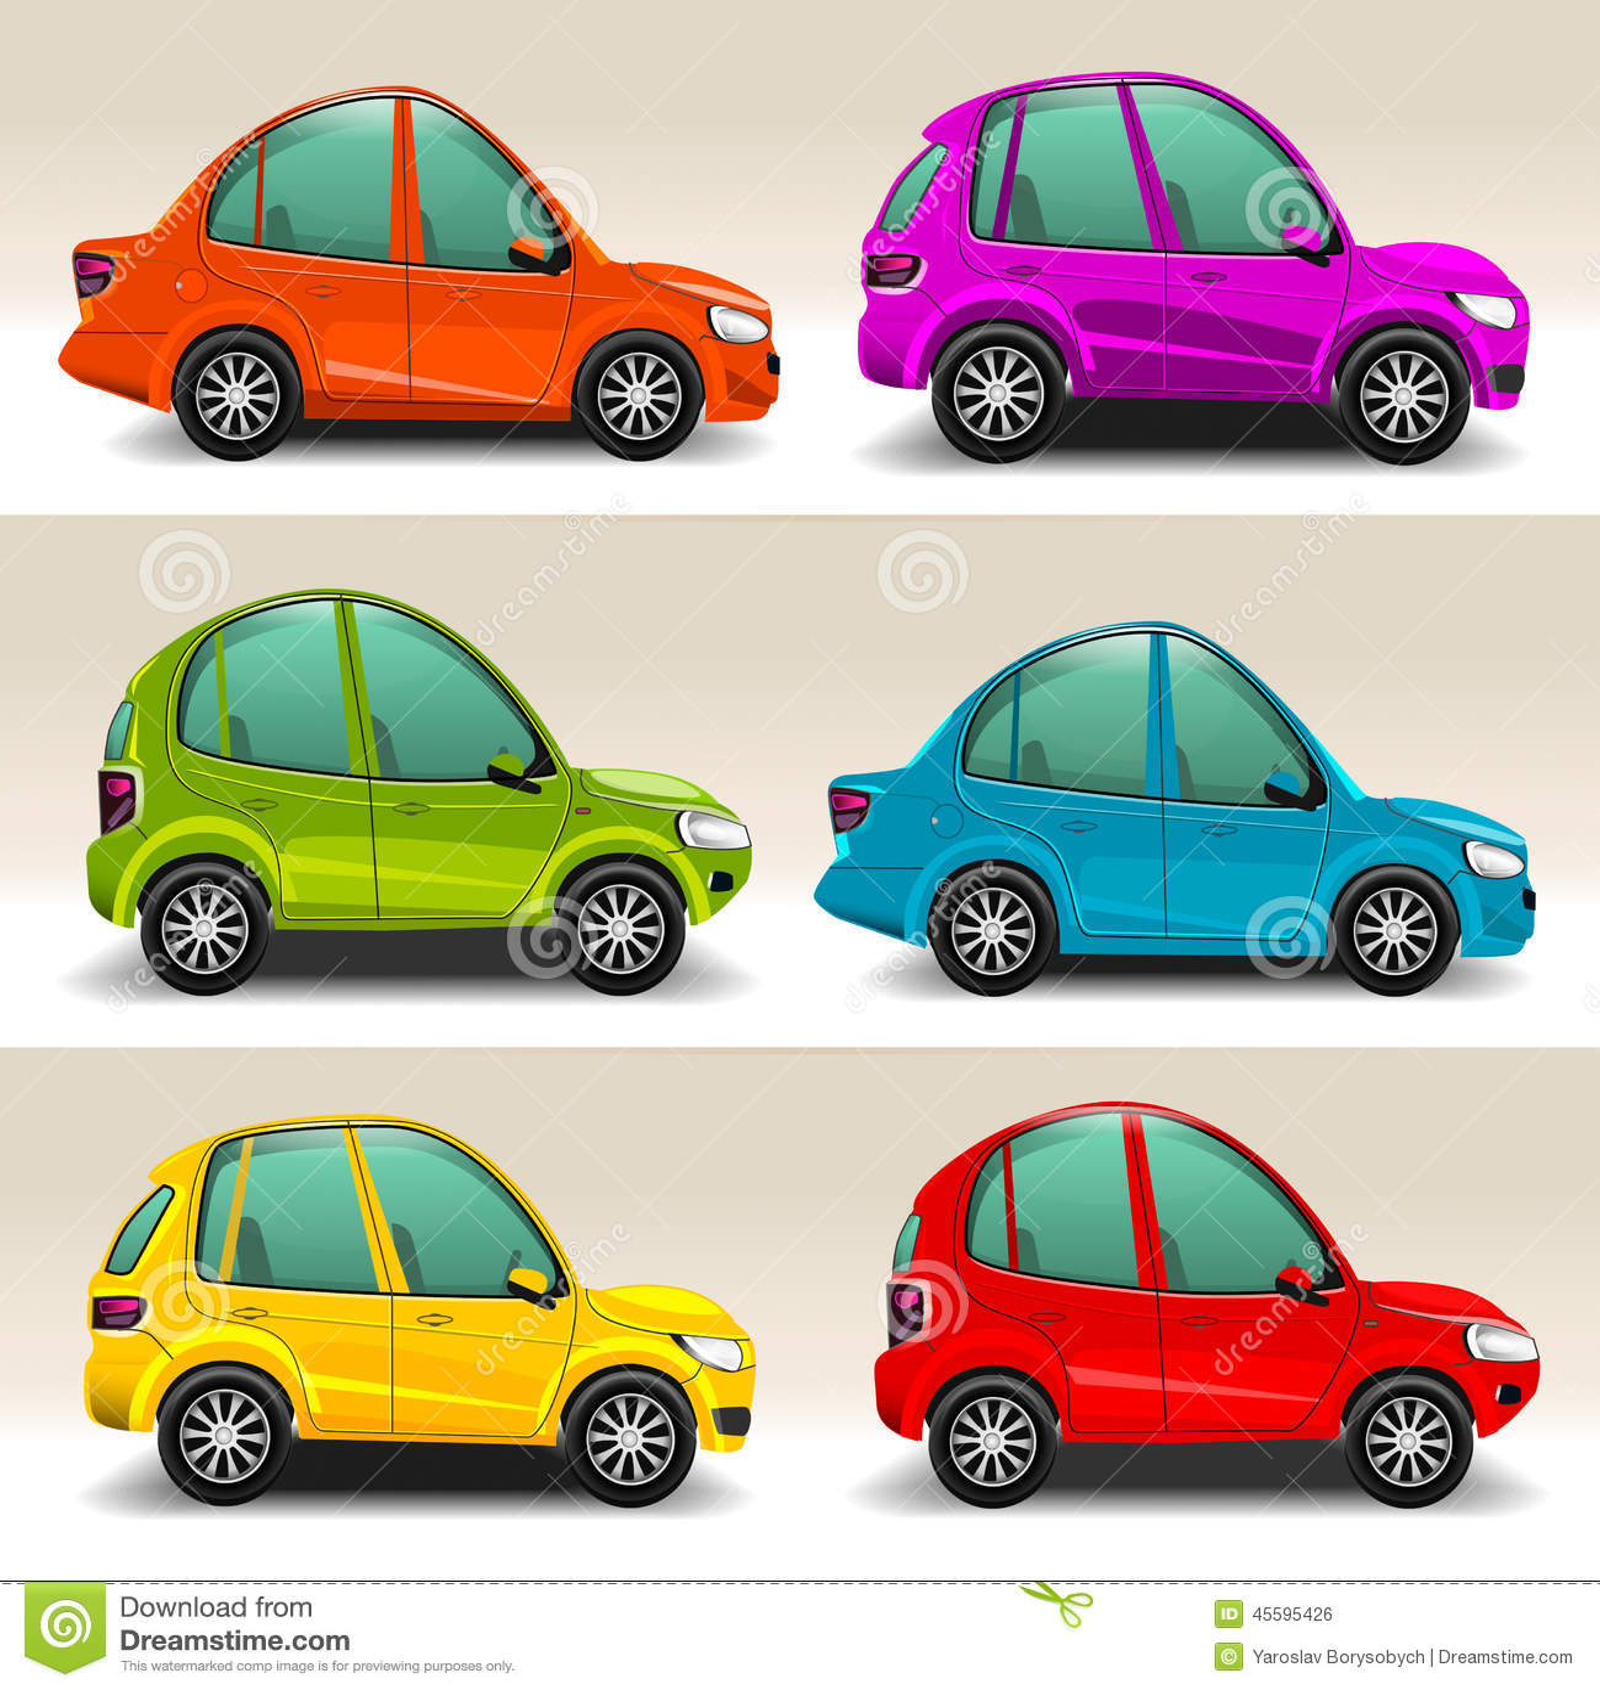 Colorful Cartoon Cars Vector Stock Vector